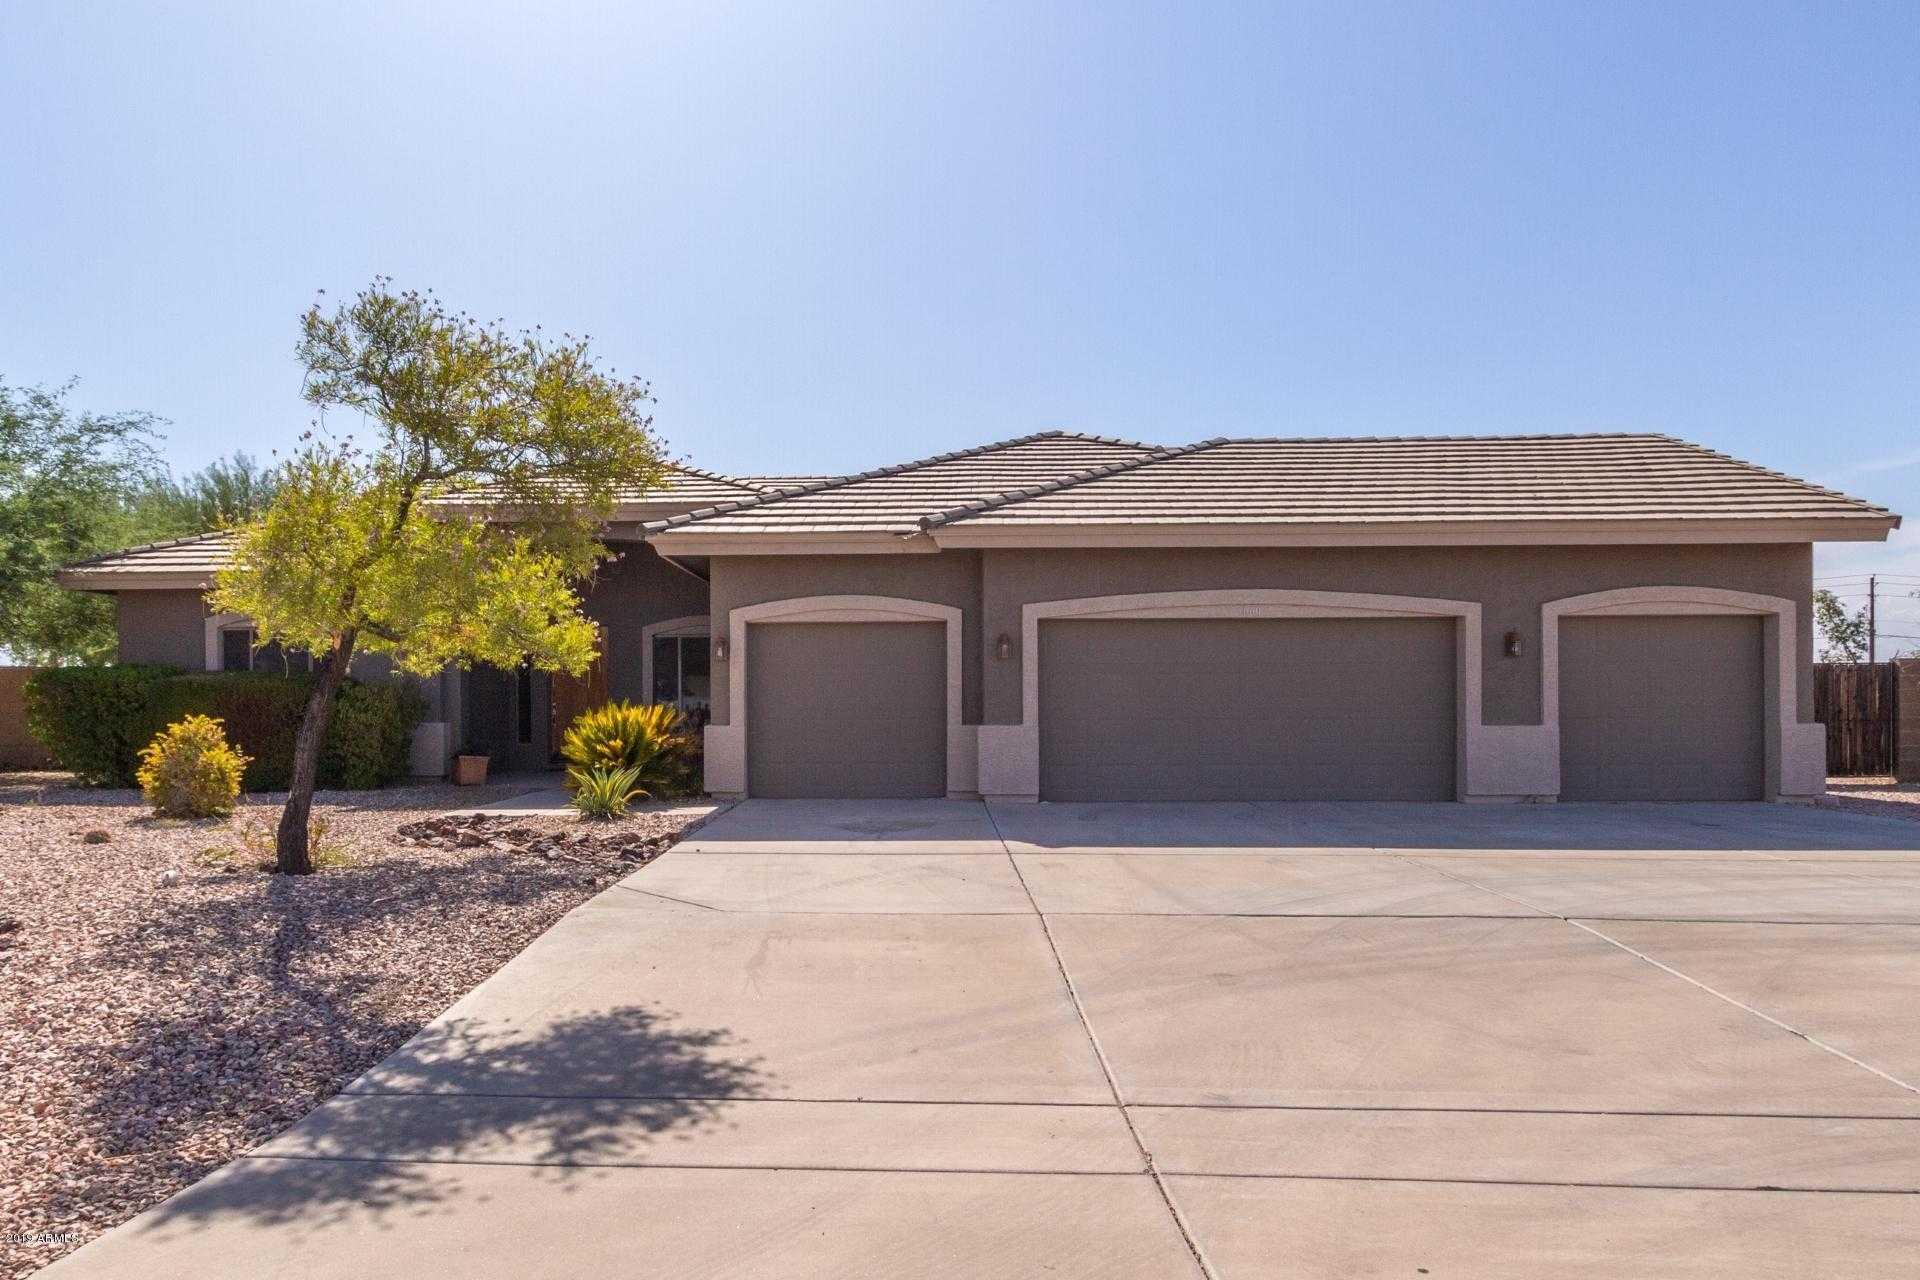 $399,000 - 3Br/3Ba - Home for Sale in Dysart Ranch, Glendale